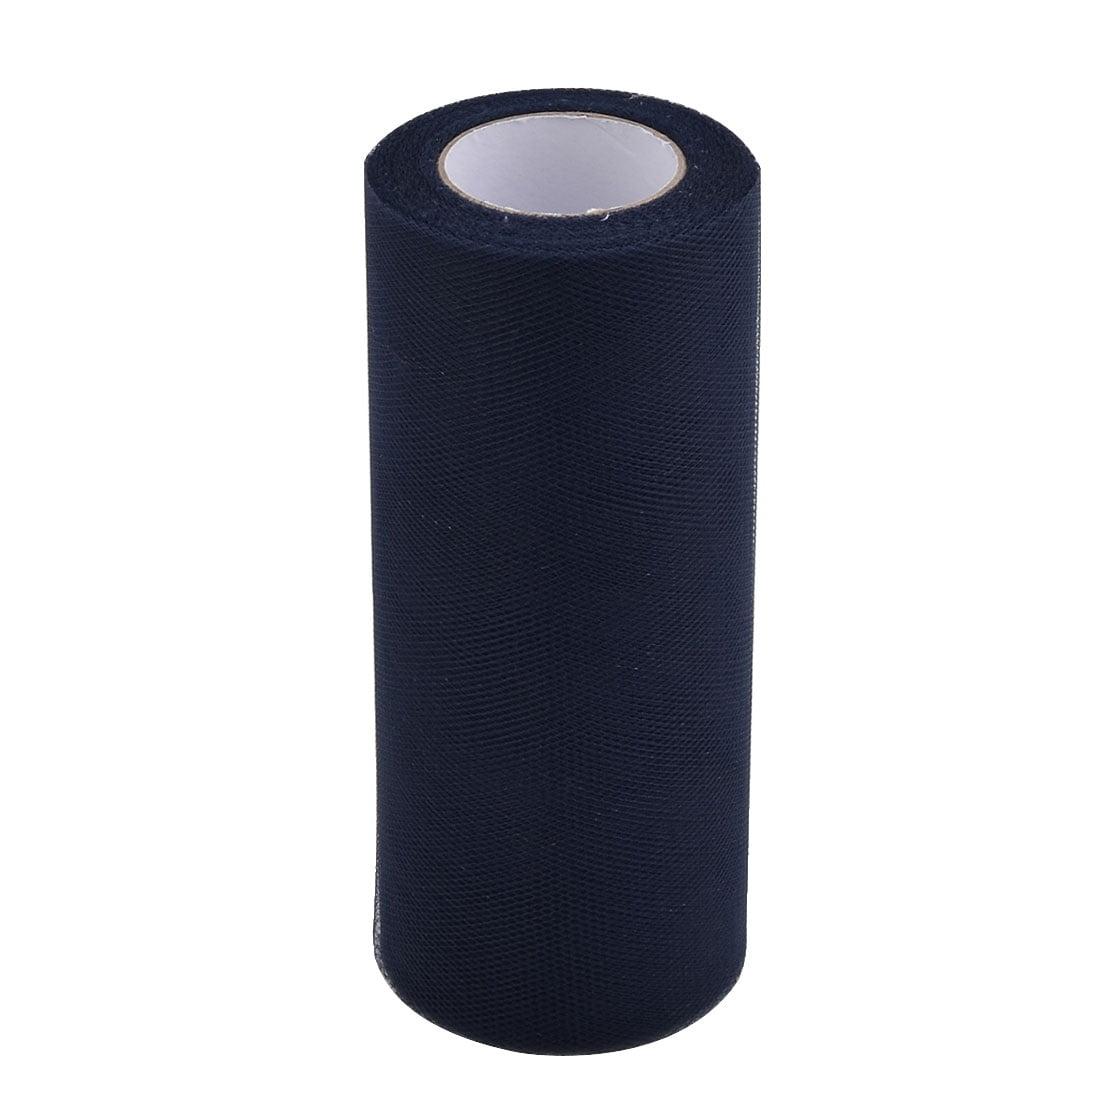 "Practical-6/"" 25 Yd Tulle Fabric Roll Spool For Wedding Bow Decoration Craft Tutu"